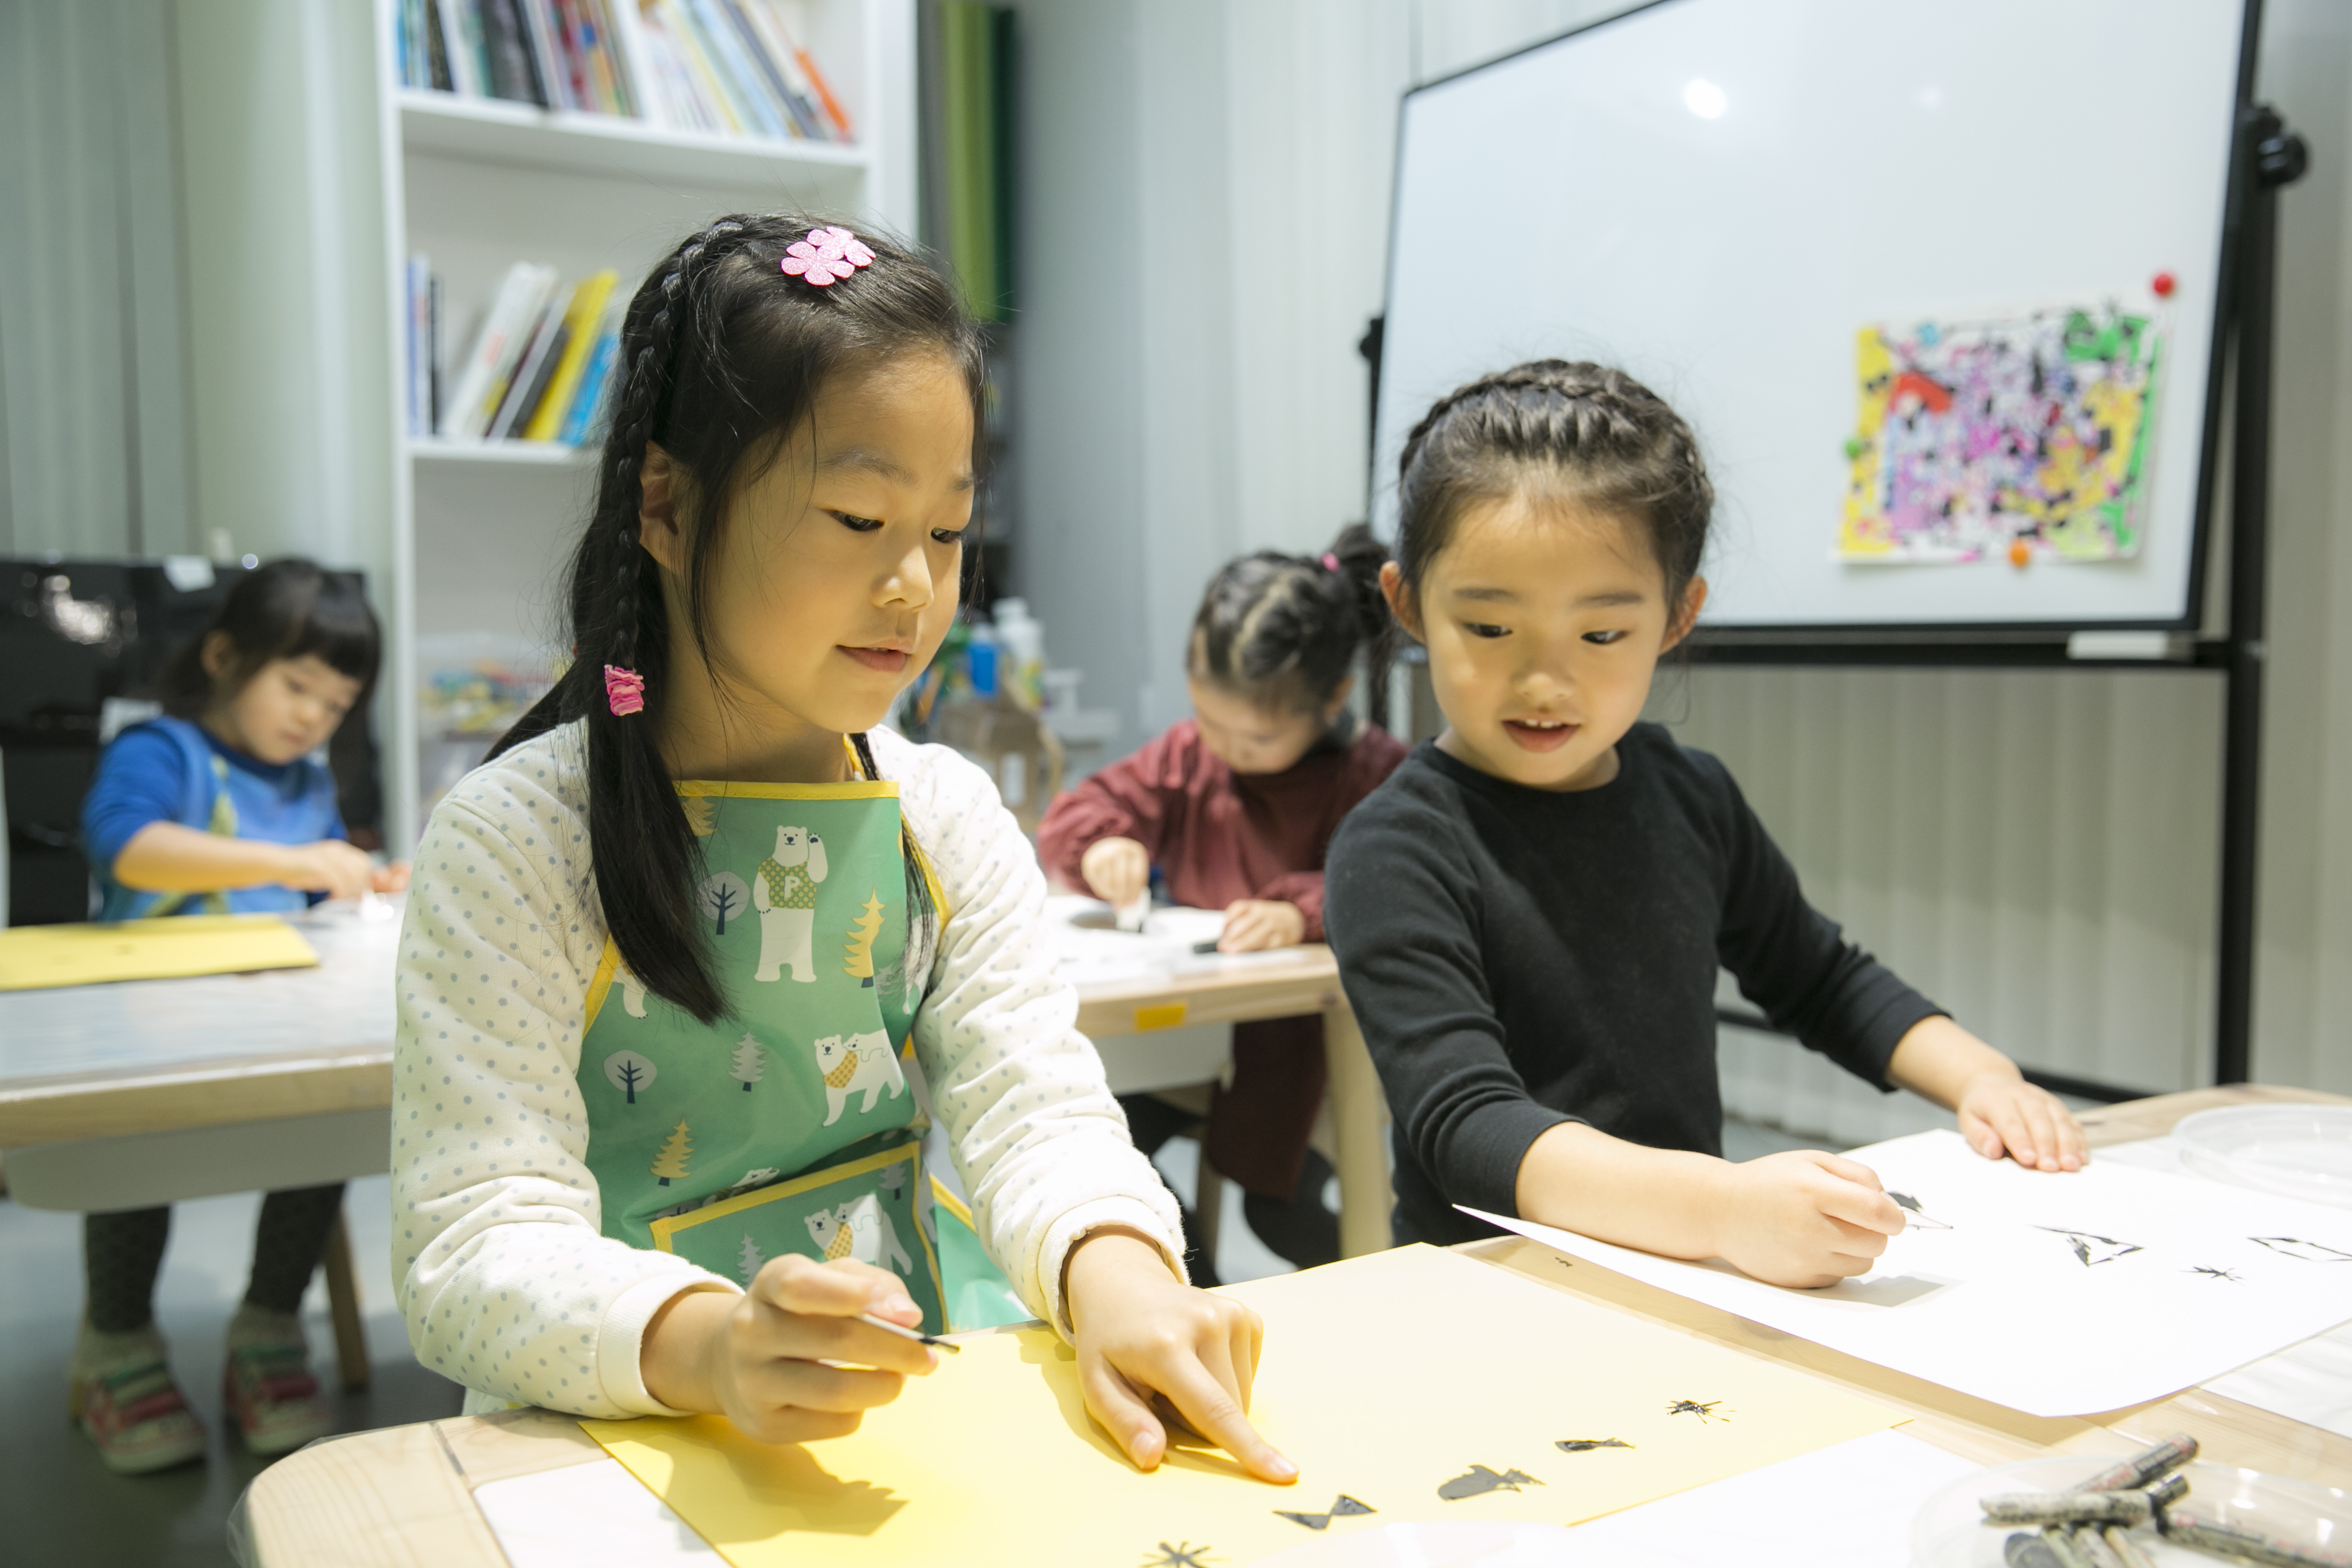 Children's Art Workshop Series – Life Journey - K11 Art Infinity - K11